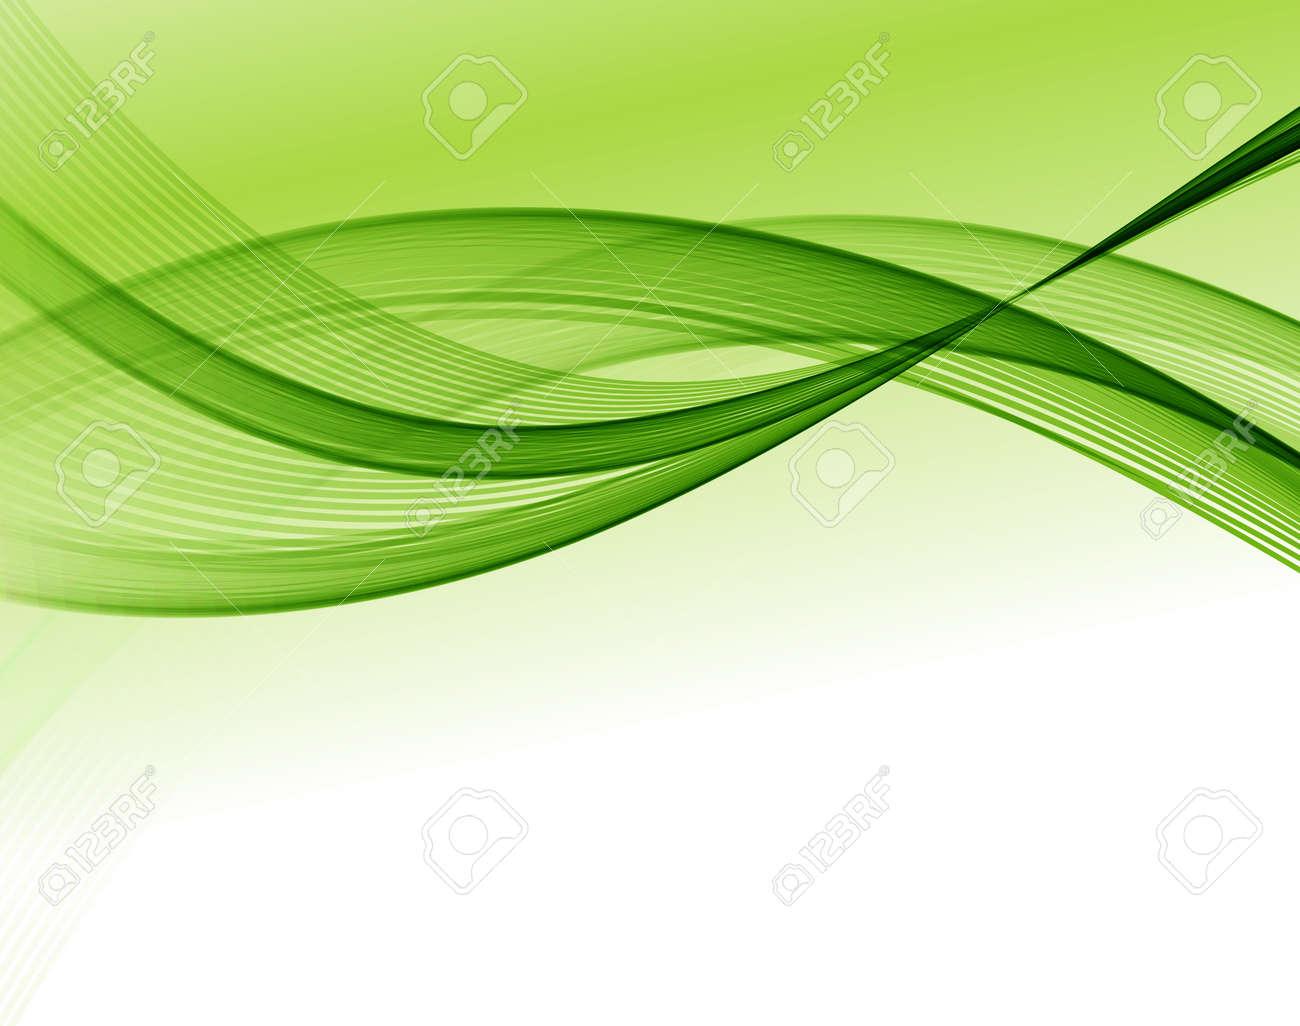 Abstract vector wave background, green waved lines for design brochure, website - 54424763